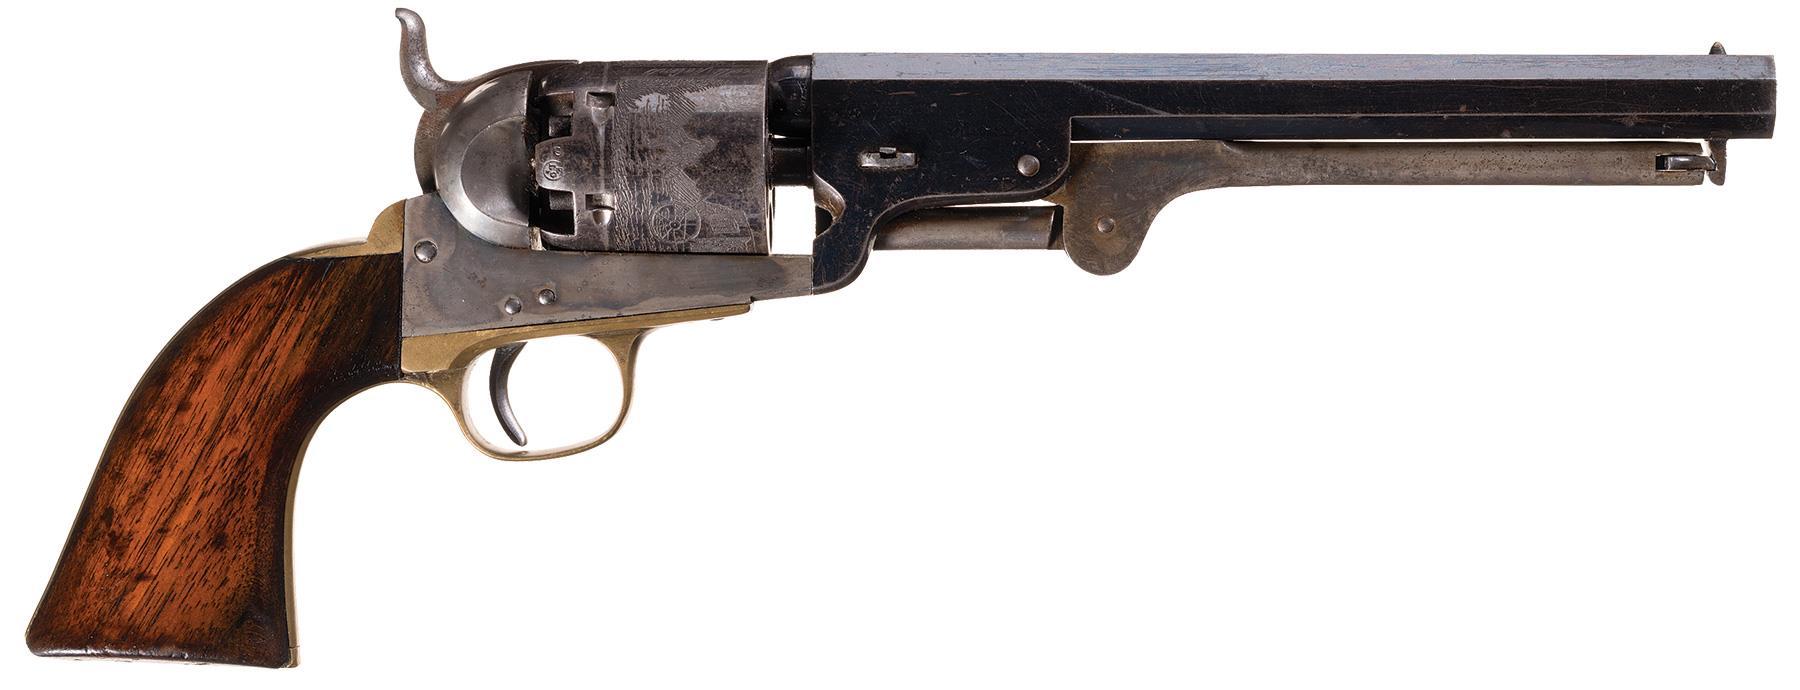 Fine Belgian Colt Brevete Model 1851 Navy Percussion Revolver